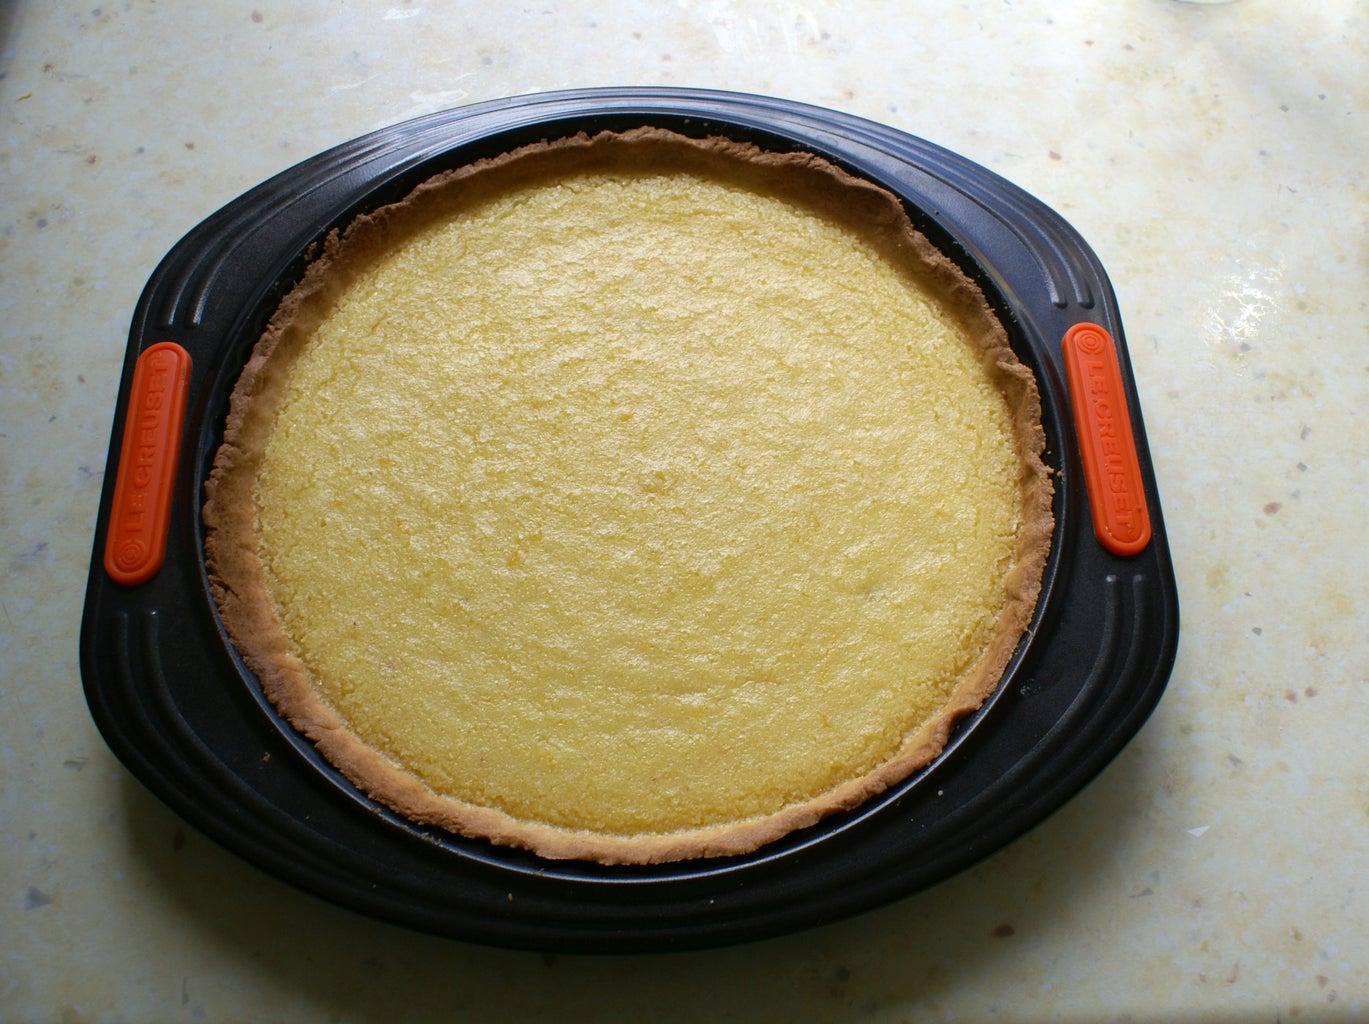 Bake the Appareil